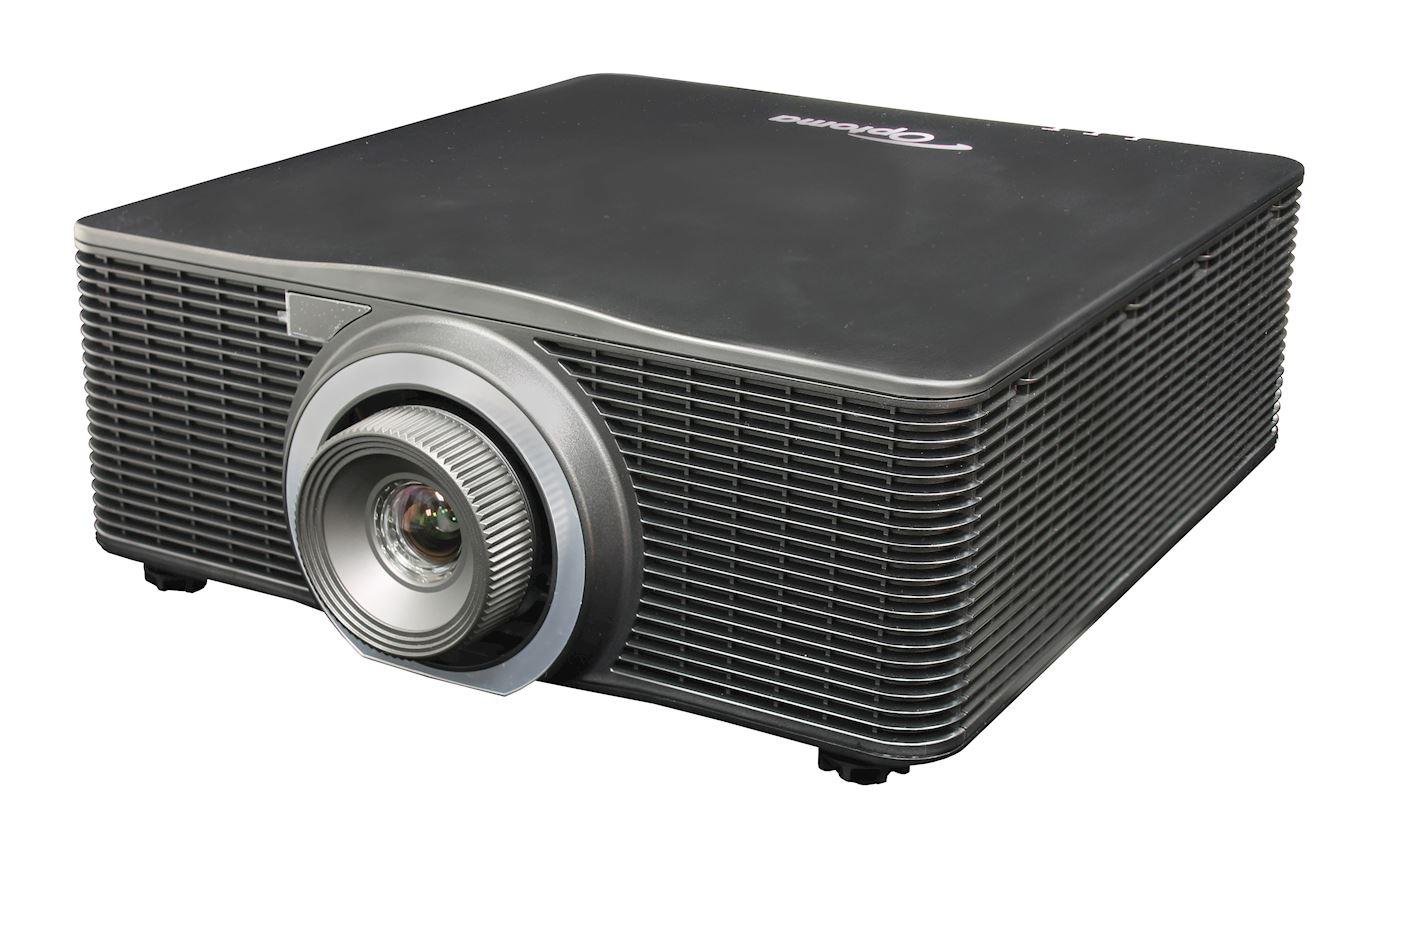 Optoma ZU850 8000lm WUXGA DLP Laser Projector